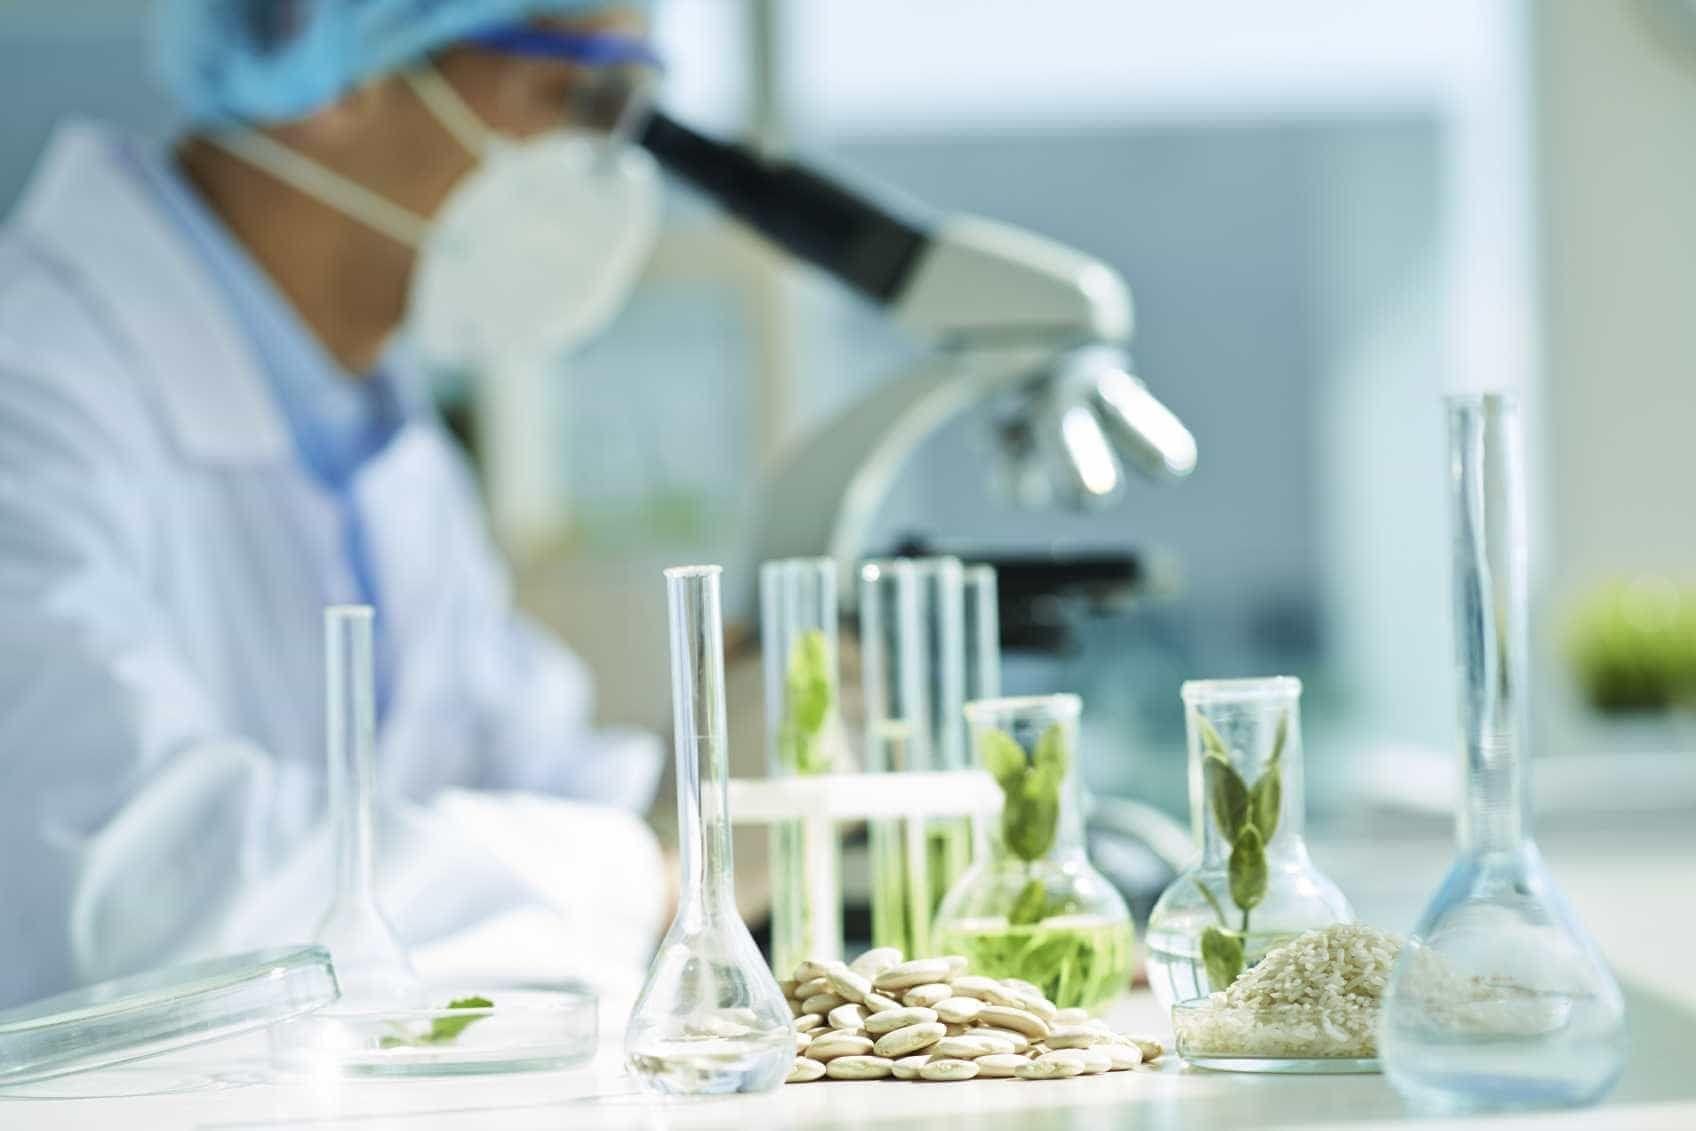 Gripe A: Investigadores portugueses descobrem mecanismo que forma vírus